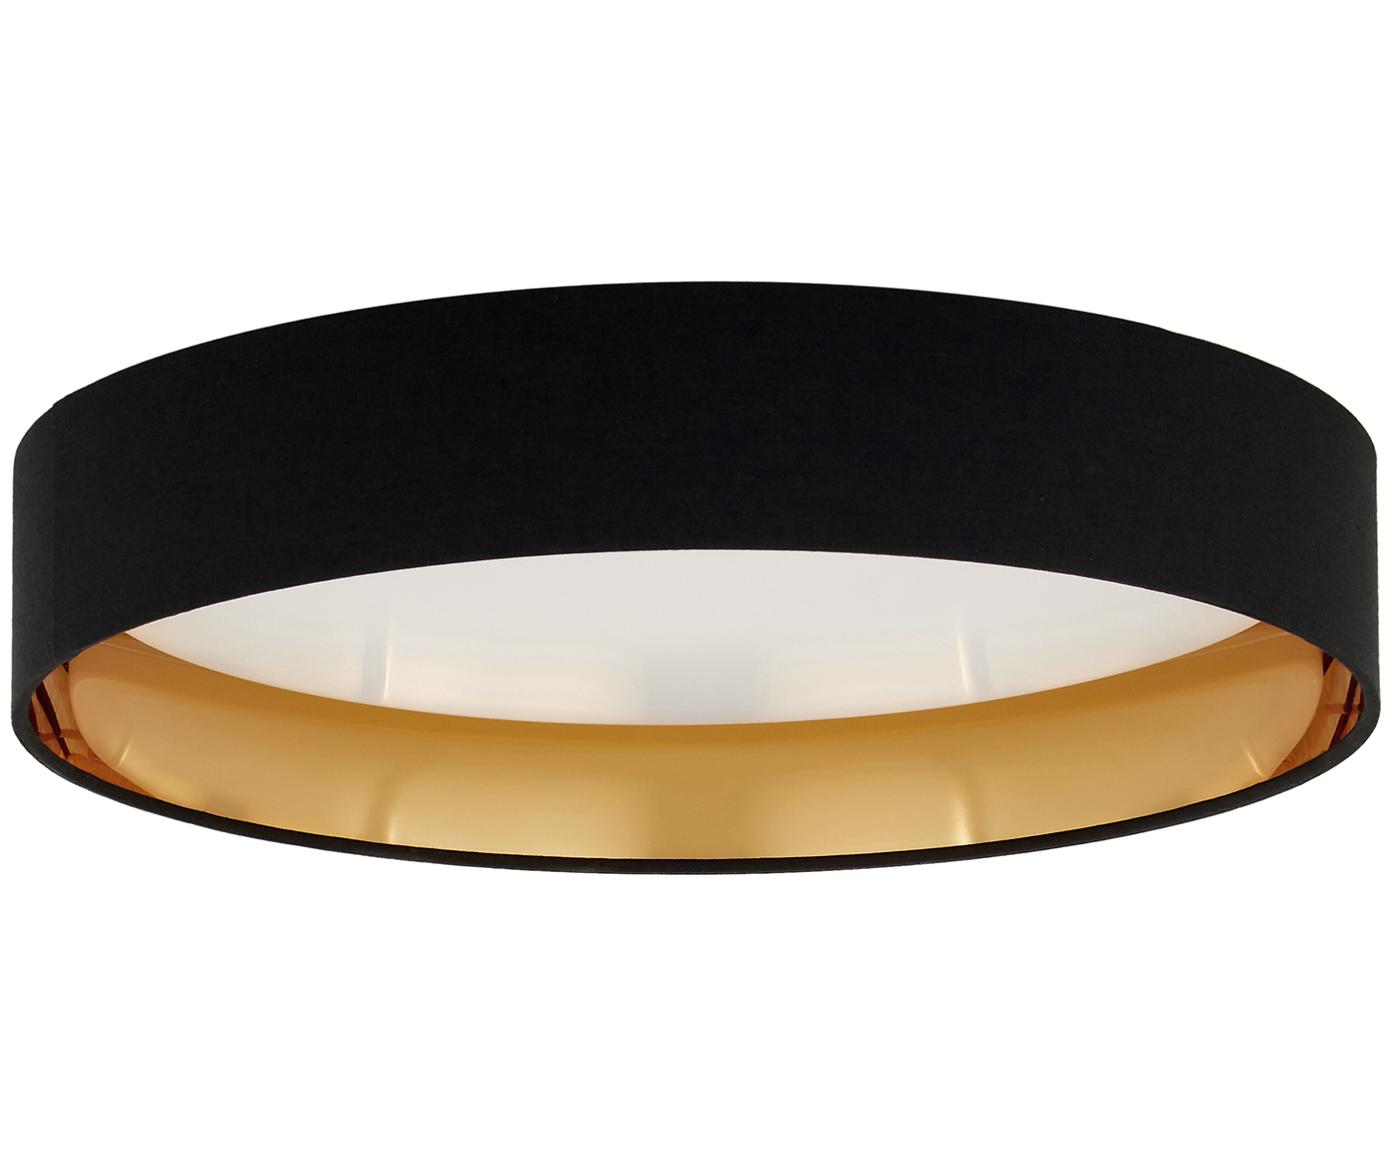 Plafoniera a LED Mallory, Cornice: metallo, Nero, Ø 41 x Alt. 10 cm